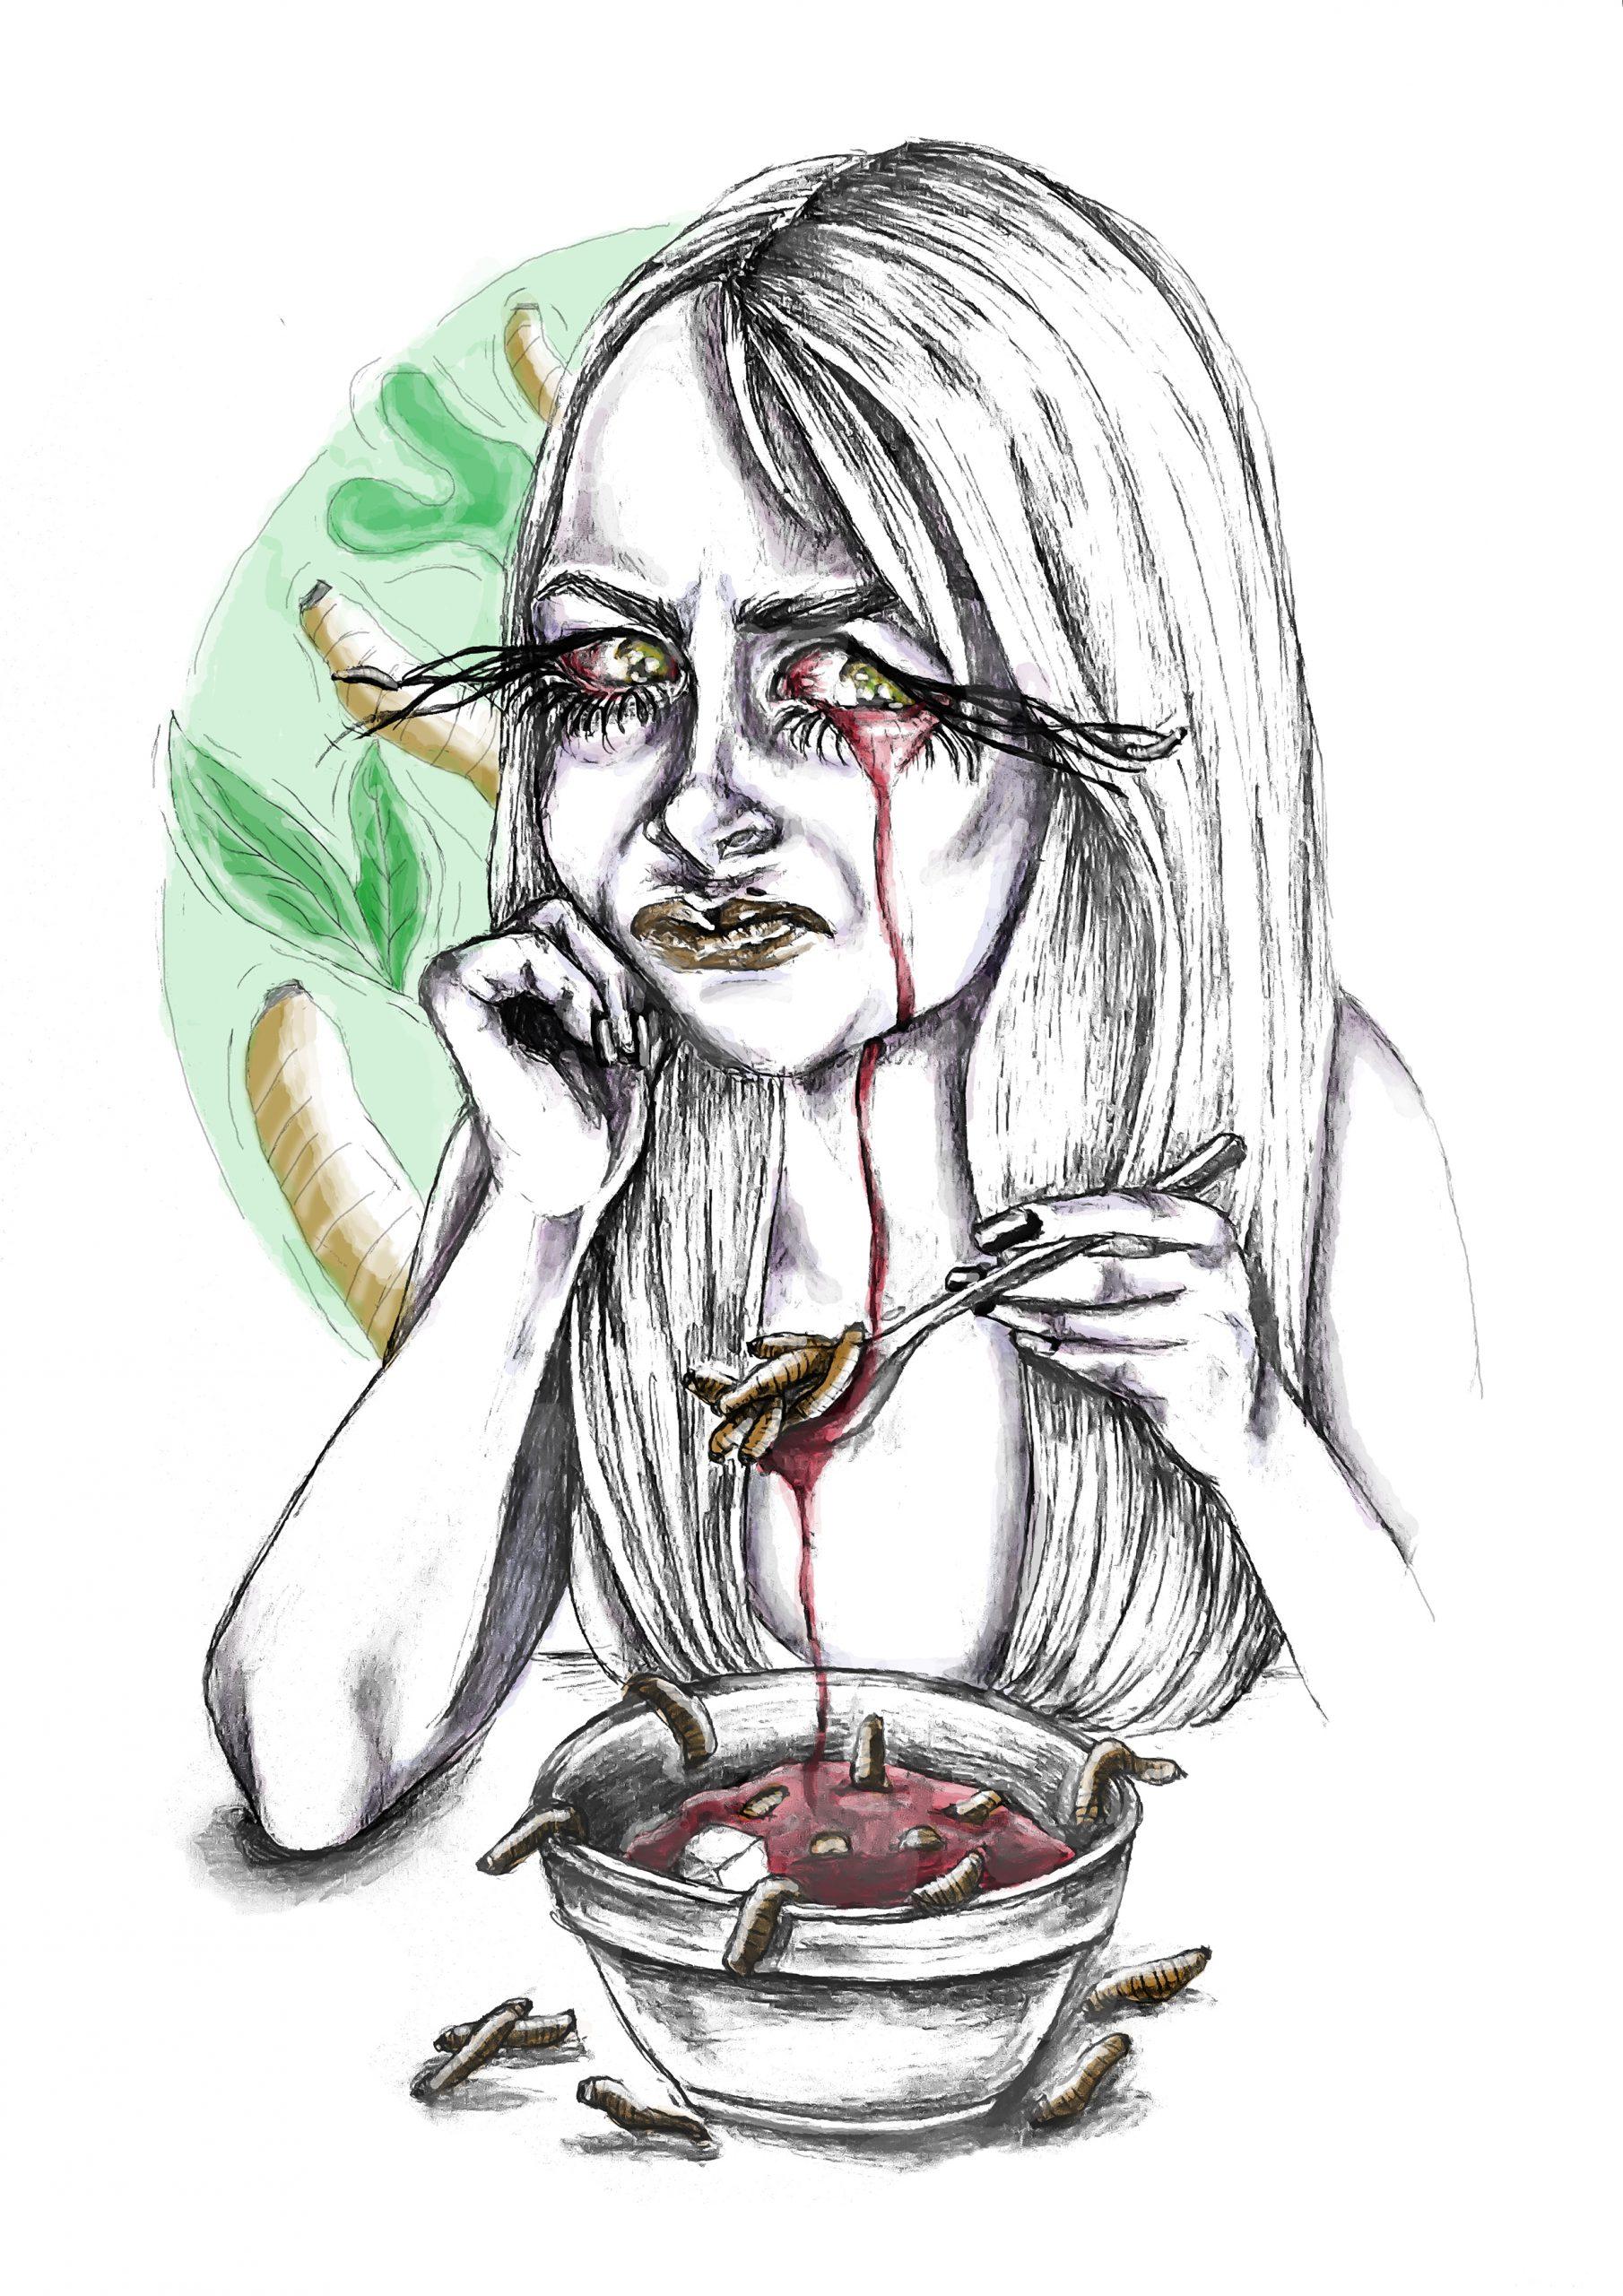 Falta de apetito stamina ilustracion sara sanchez un mal trago libro